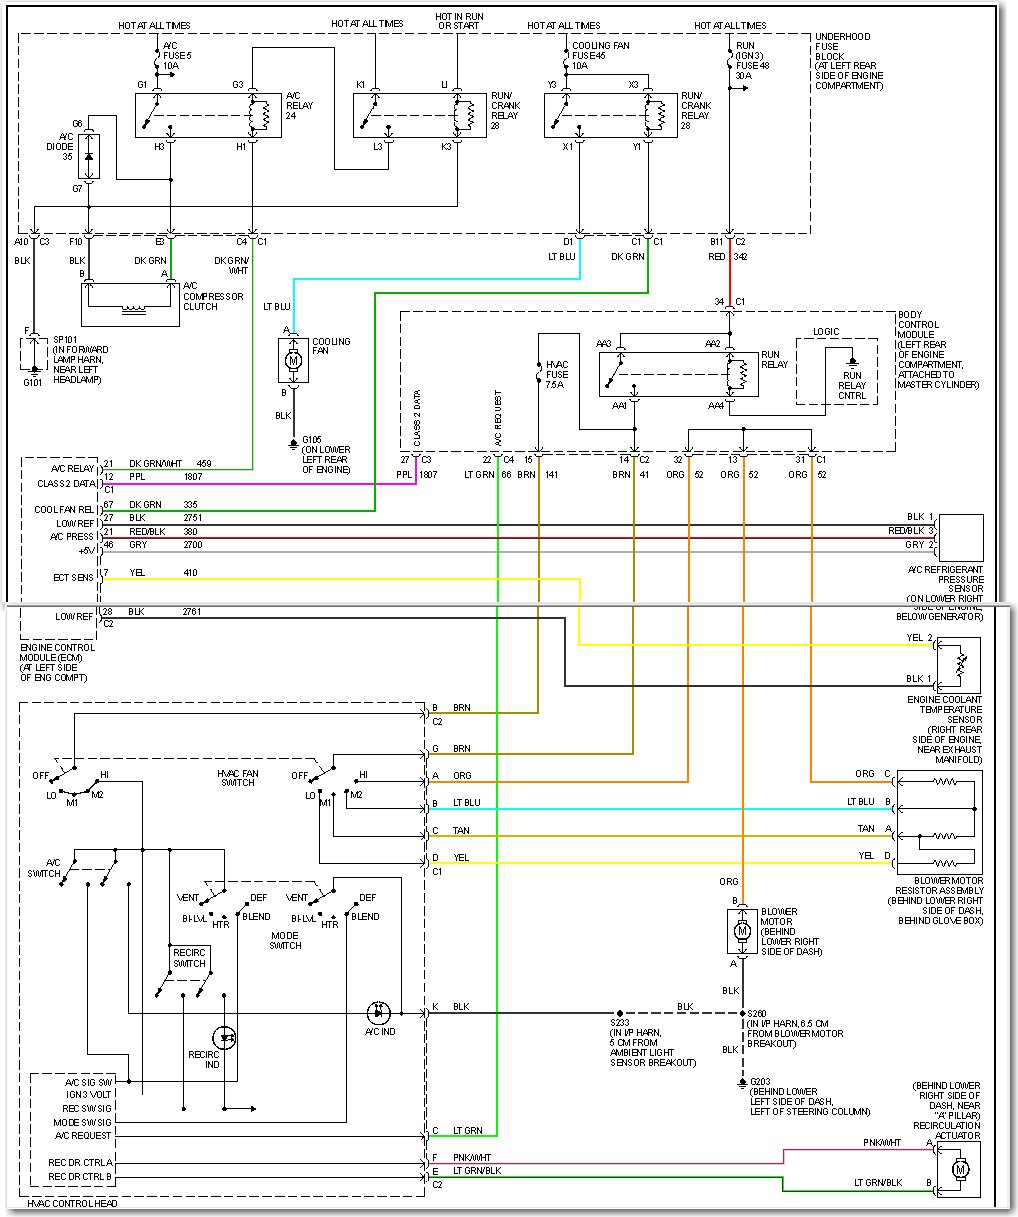 saturn ac wiring diagram - wiring diagram system magazine-image -  magazine-image.ediliadesign.it  ediliadesign.it